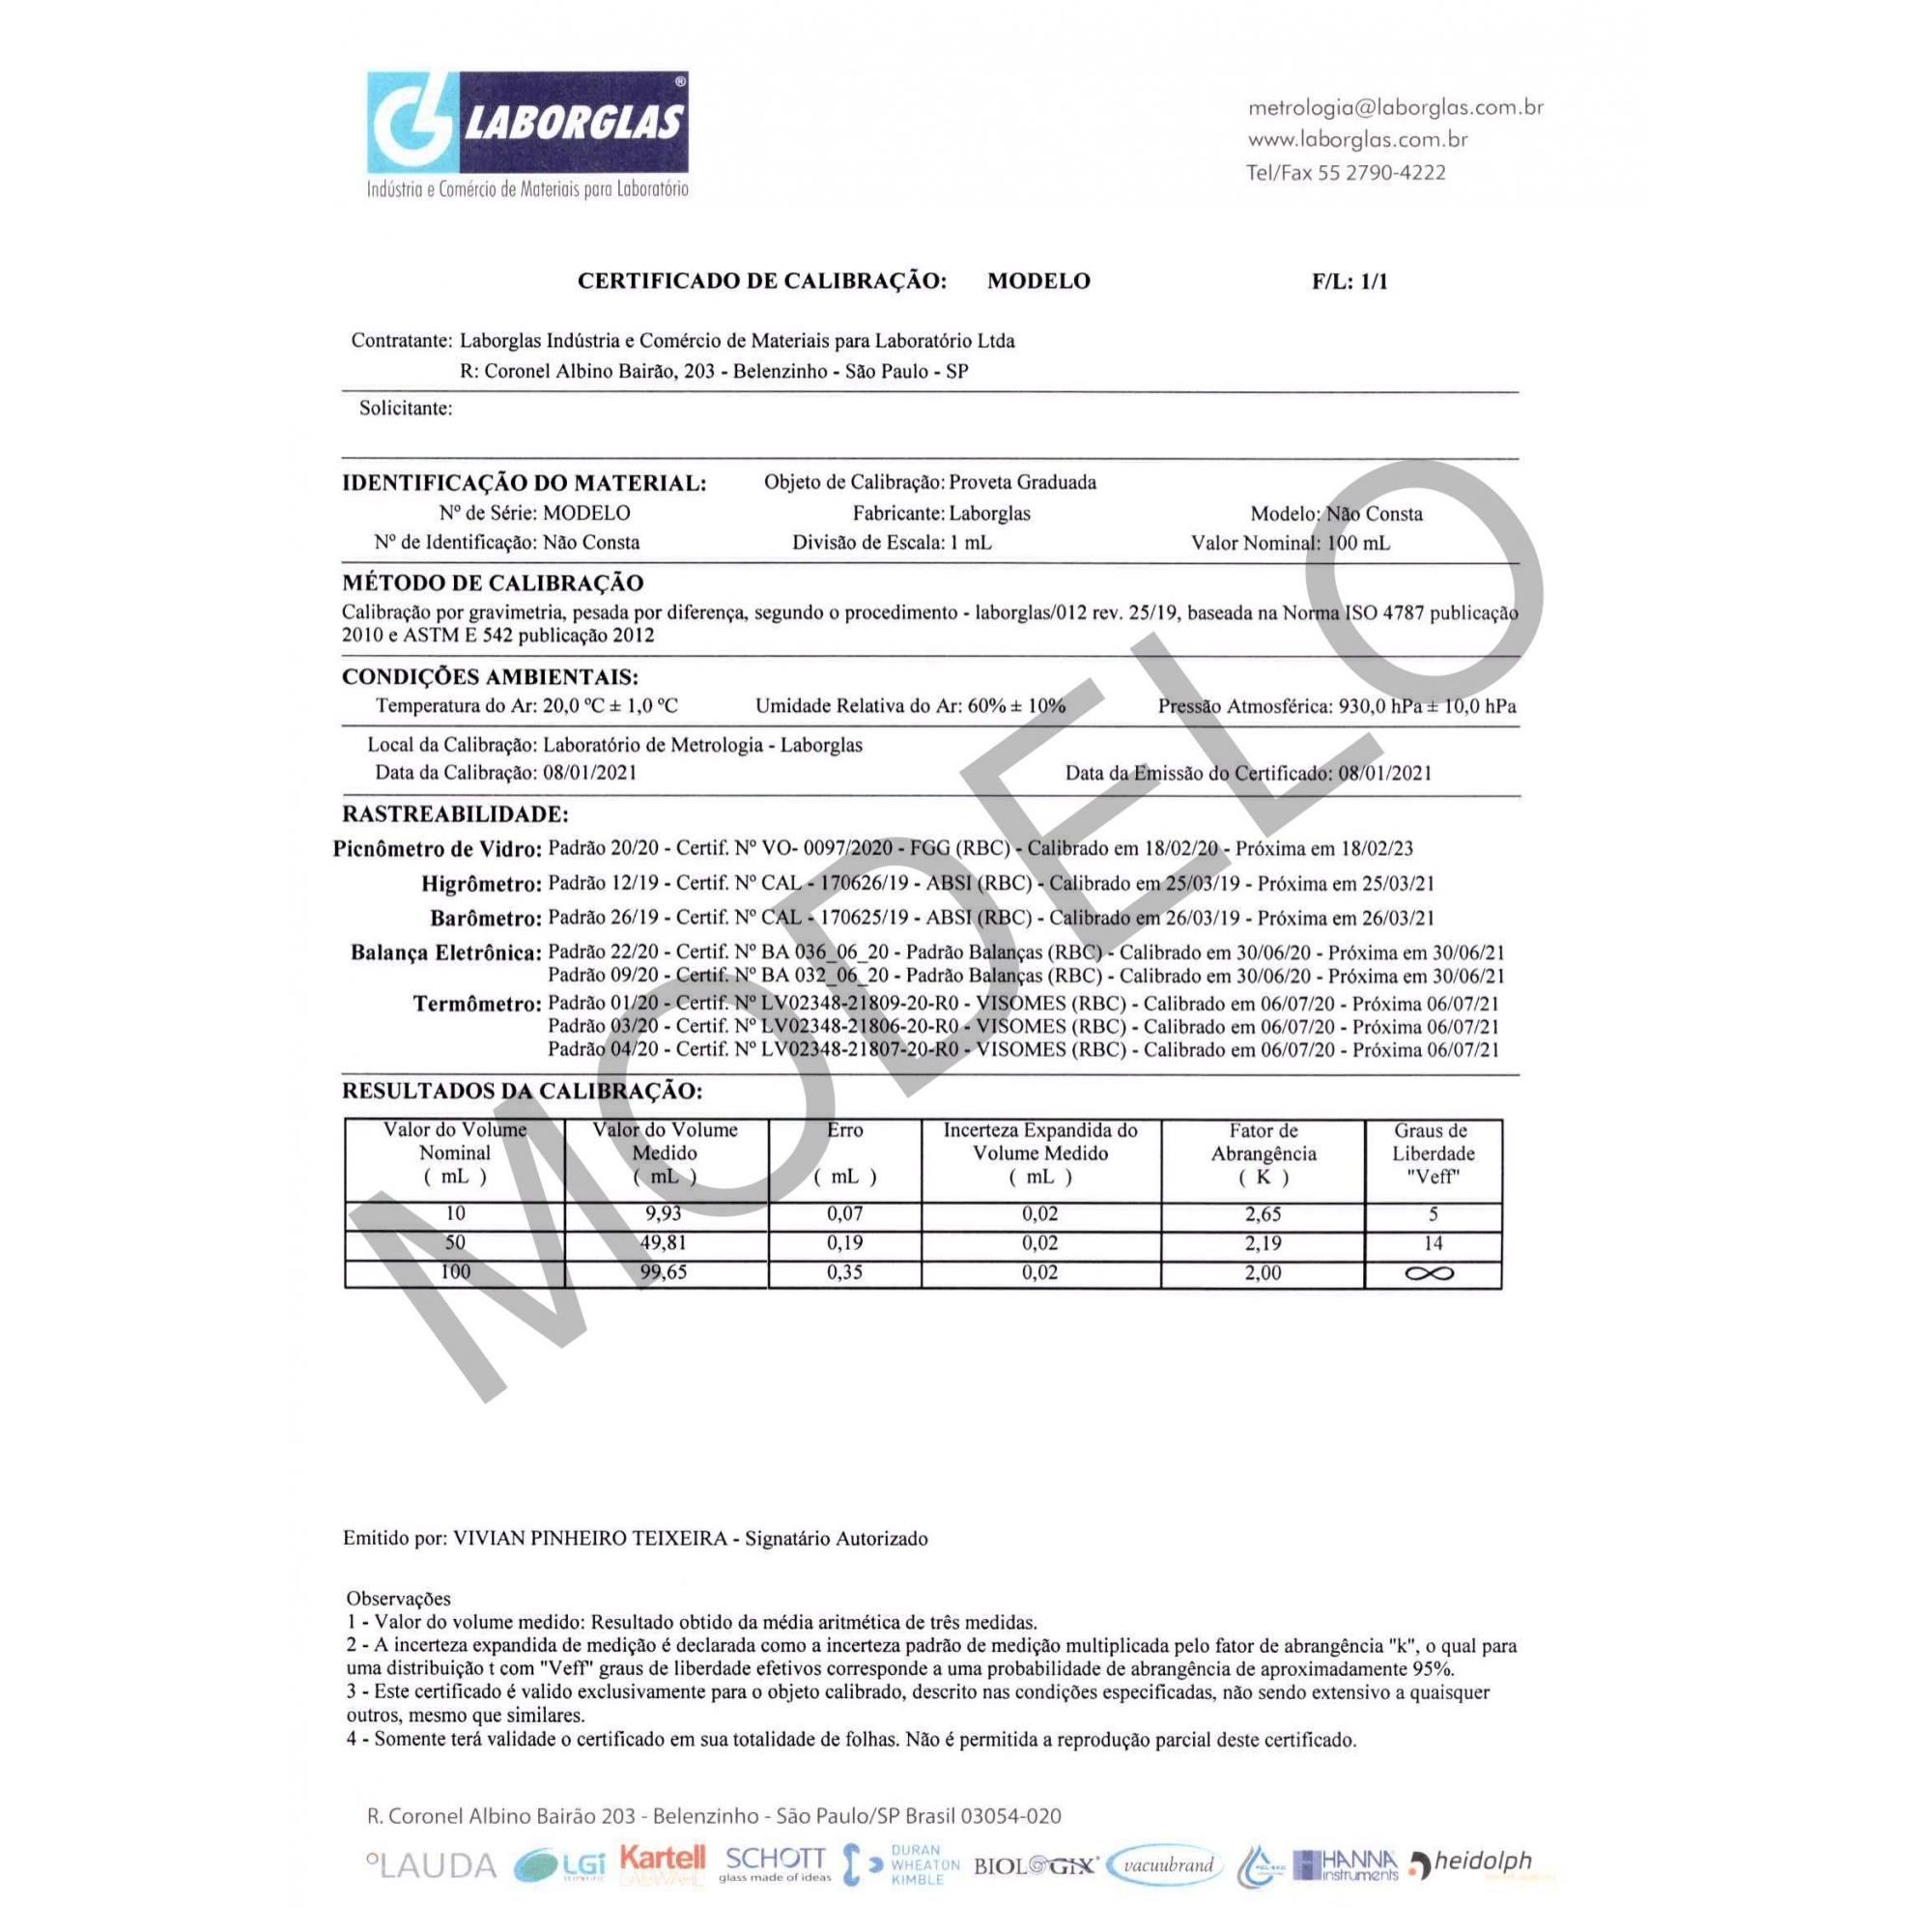 PROVETA GRADUADA BASE HEXAGONAL DE POLIPROPILENO 50 ML CLASSE A CERTIFICADO RASTREÁVEL - Laborglas - Cód. 9138717-C